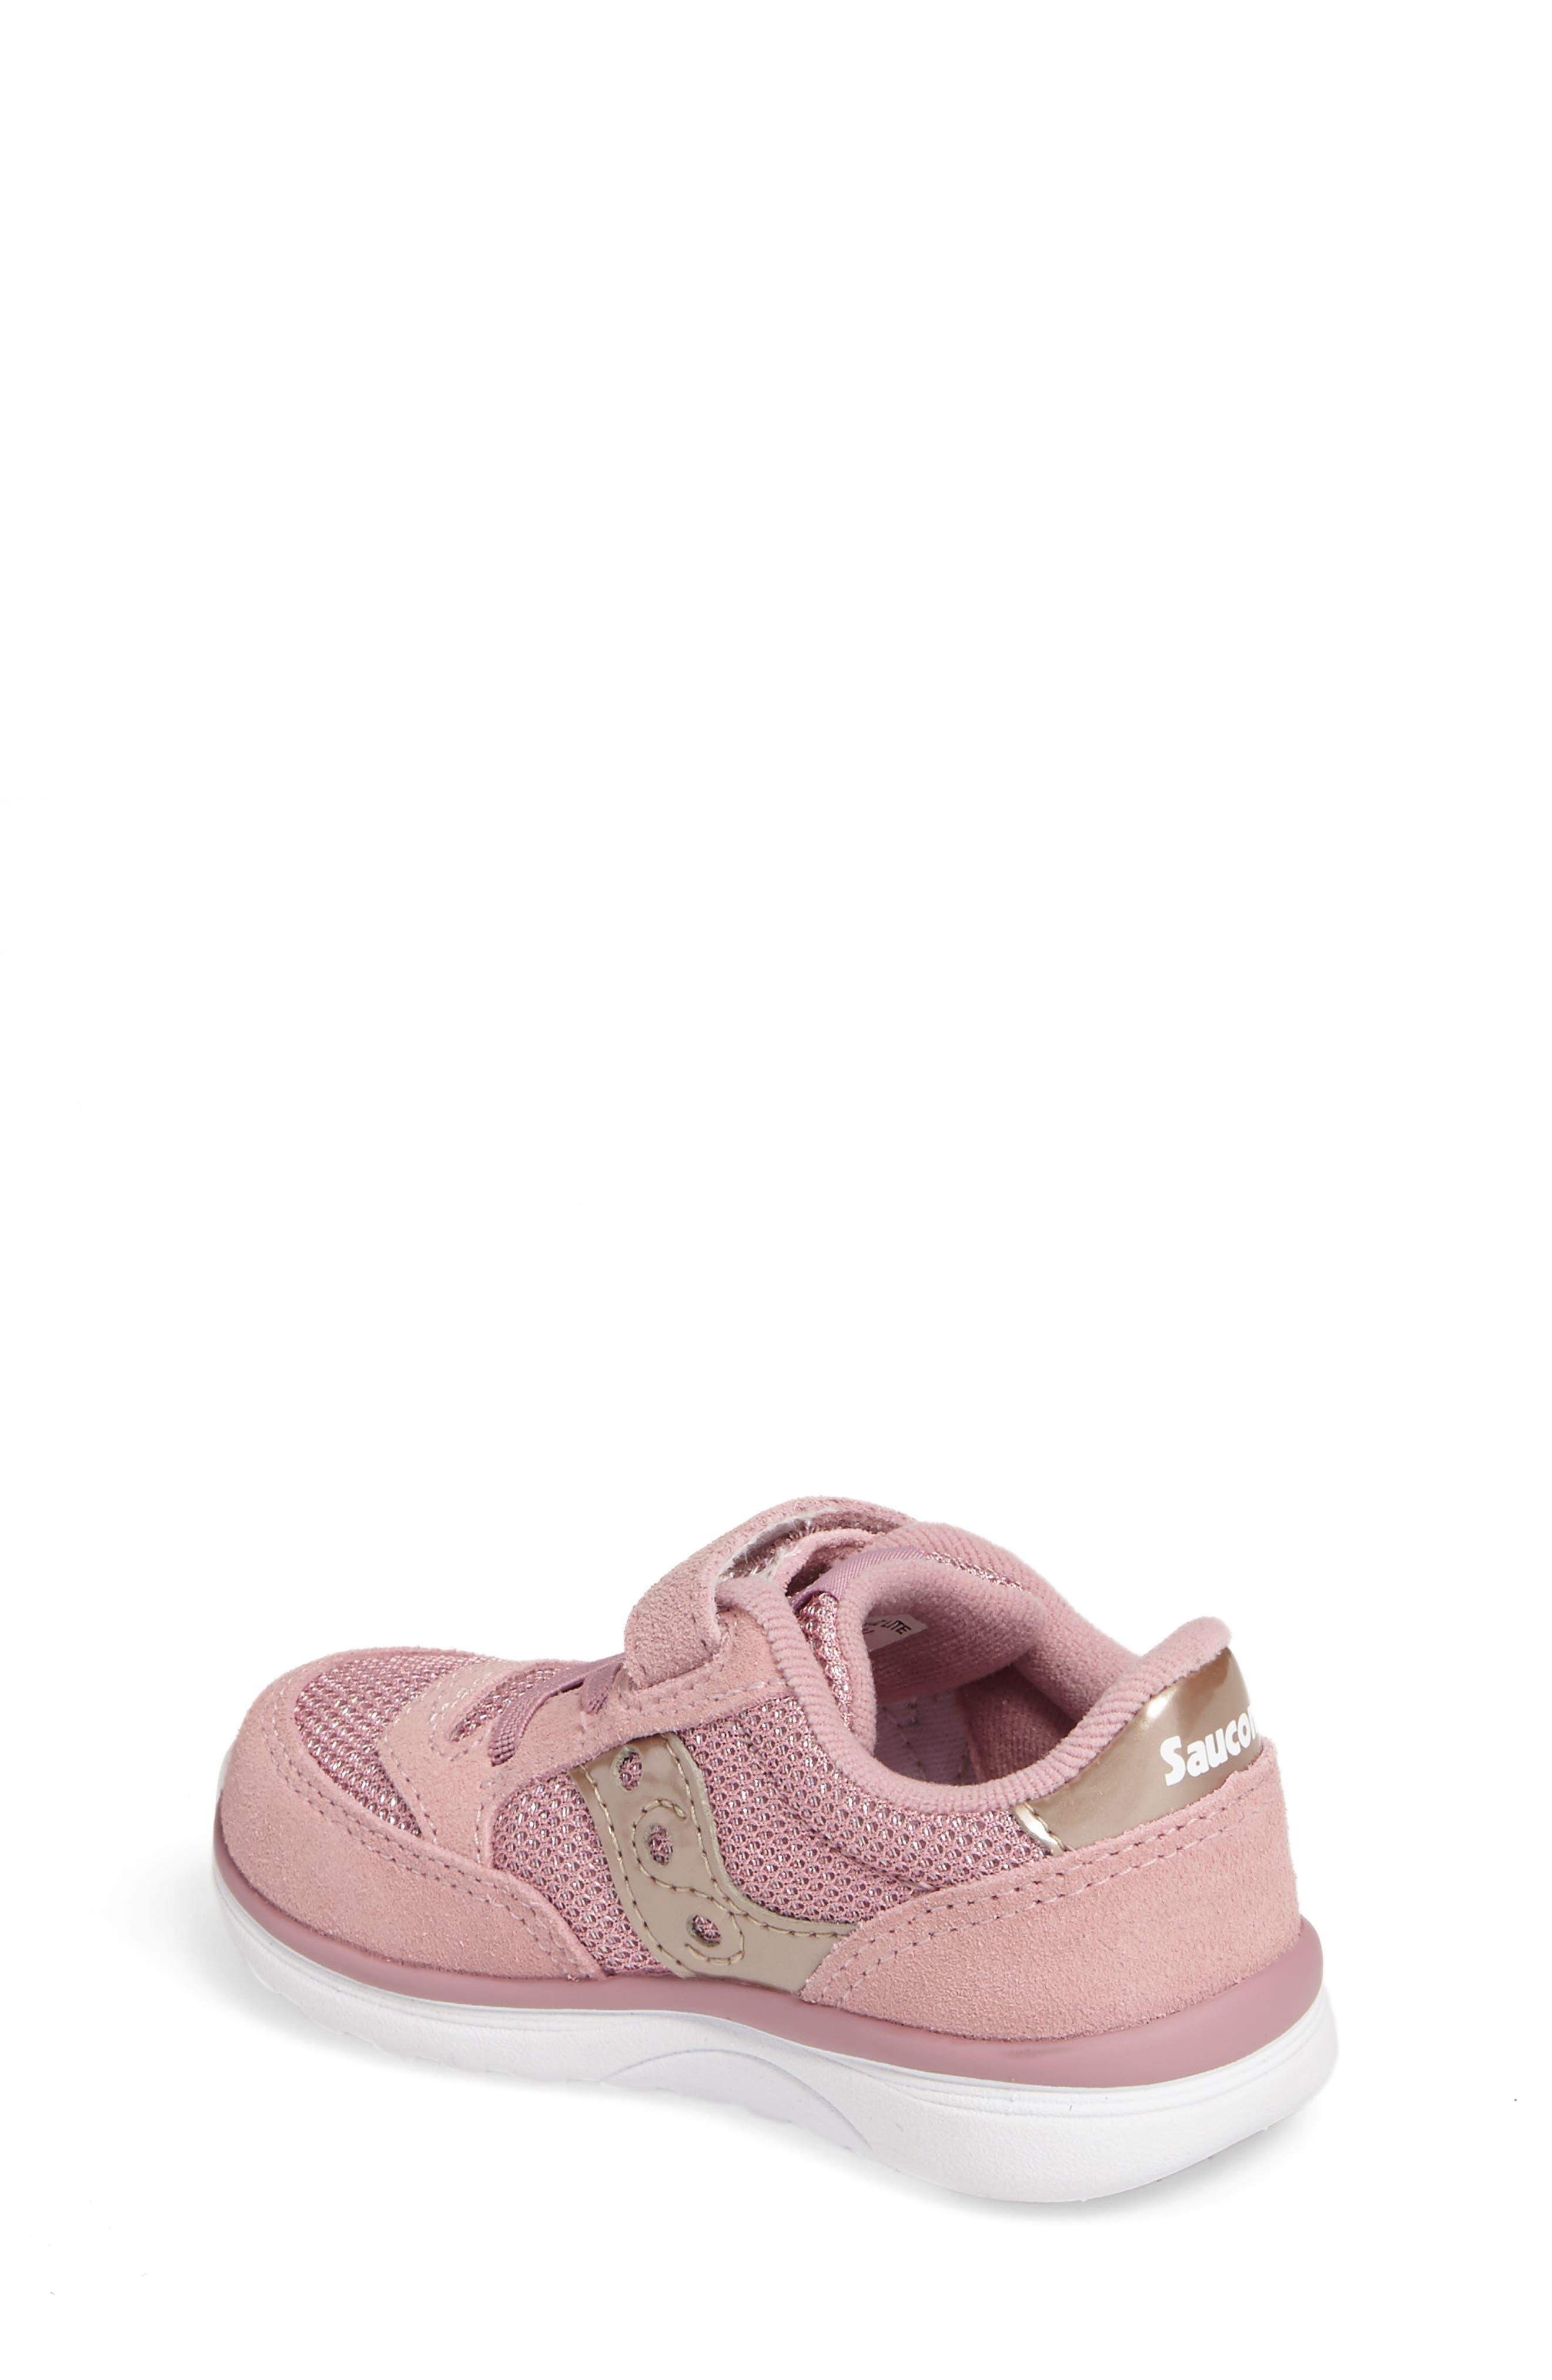 Jazz Lite Sneaker,                             Alternate thumbnail 2, color,                             Blush Metallic